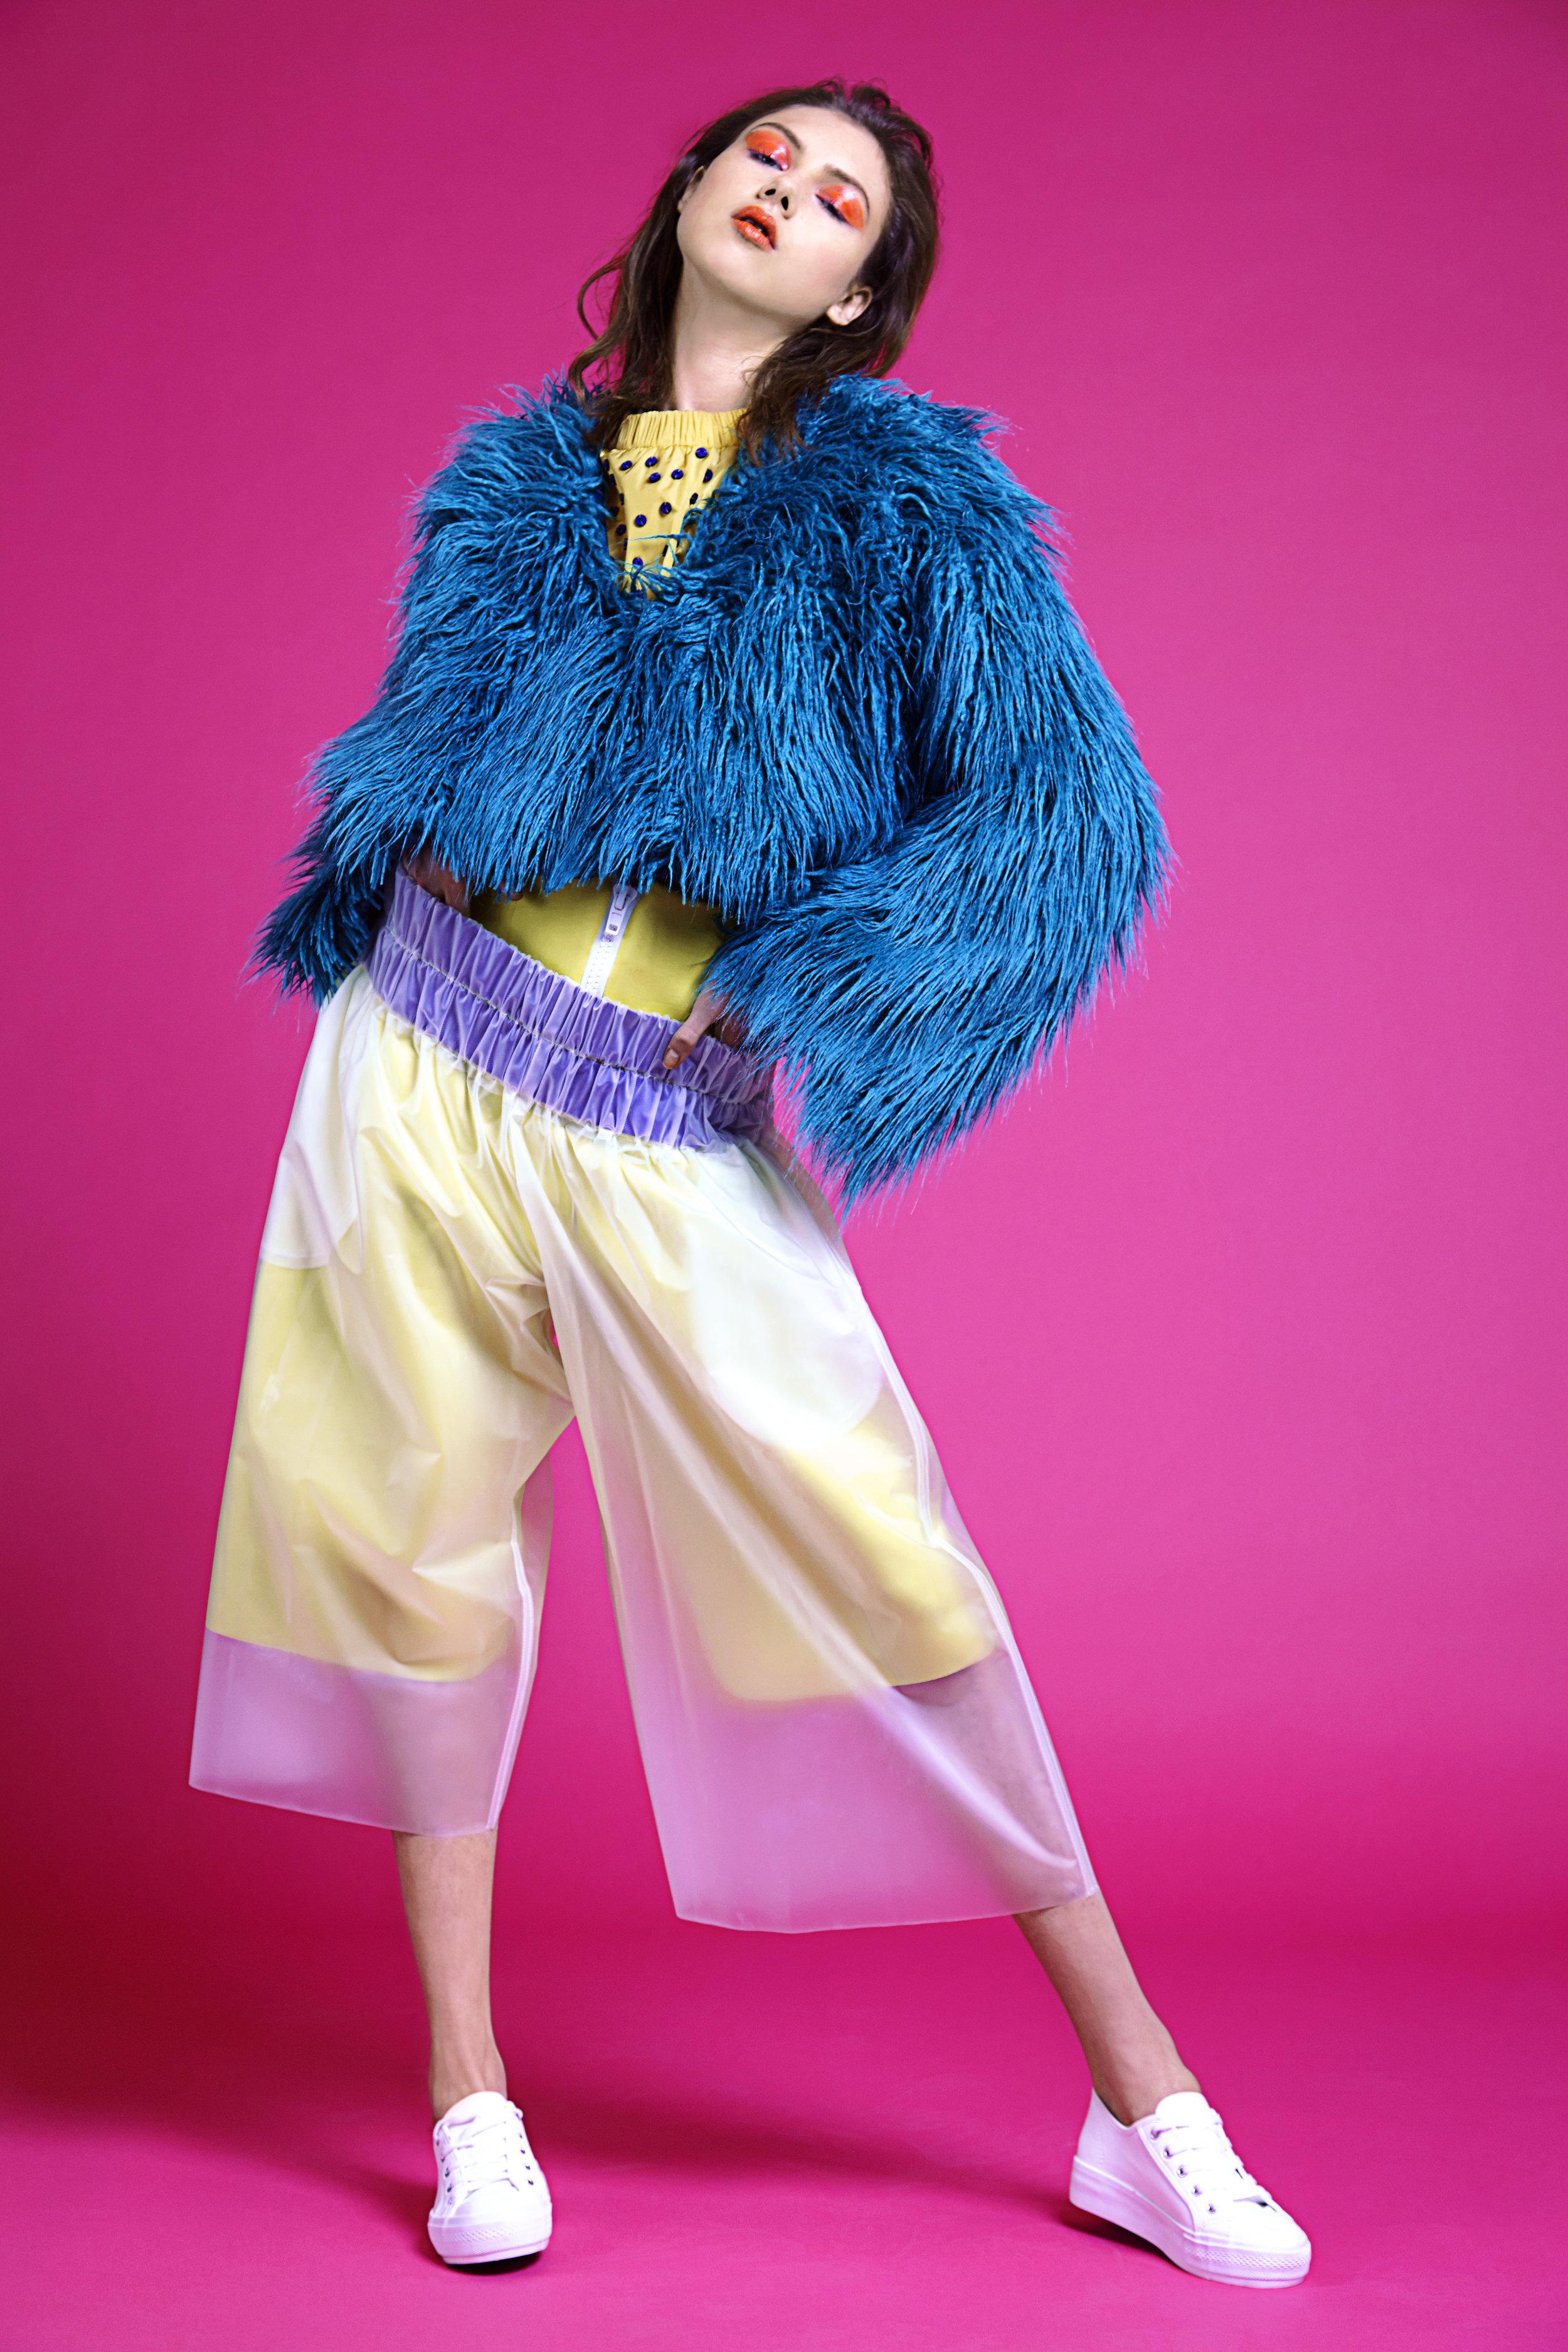 Top  Nataliya Brady , Jacket  Jade Davies , Trousers  Nataliya Brady , Shoes  New Look